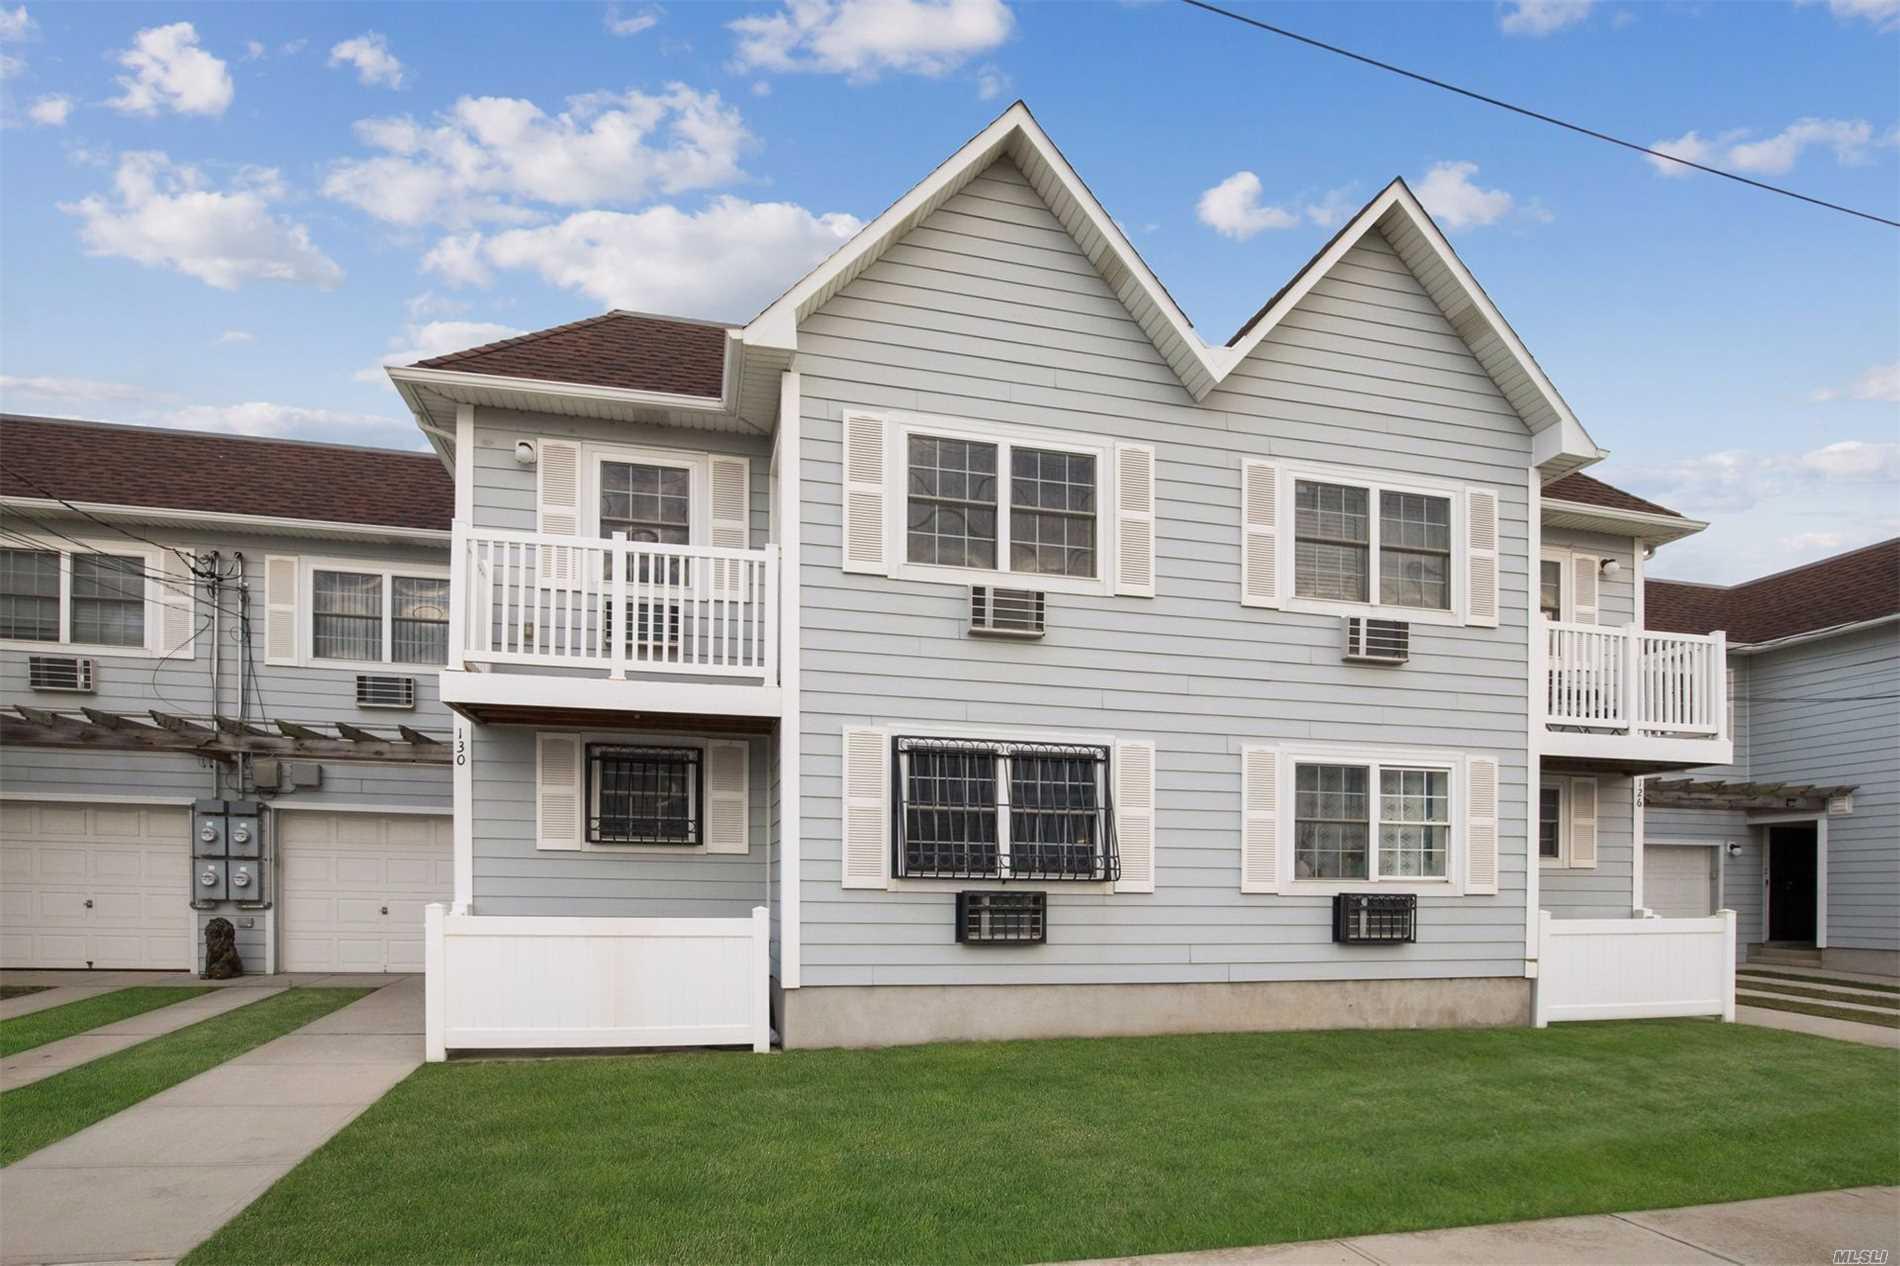 Property for sale at 130 Beach 62 St, Arverne NY 11692, Arverne,  New York 11692